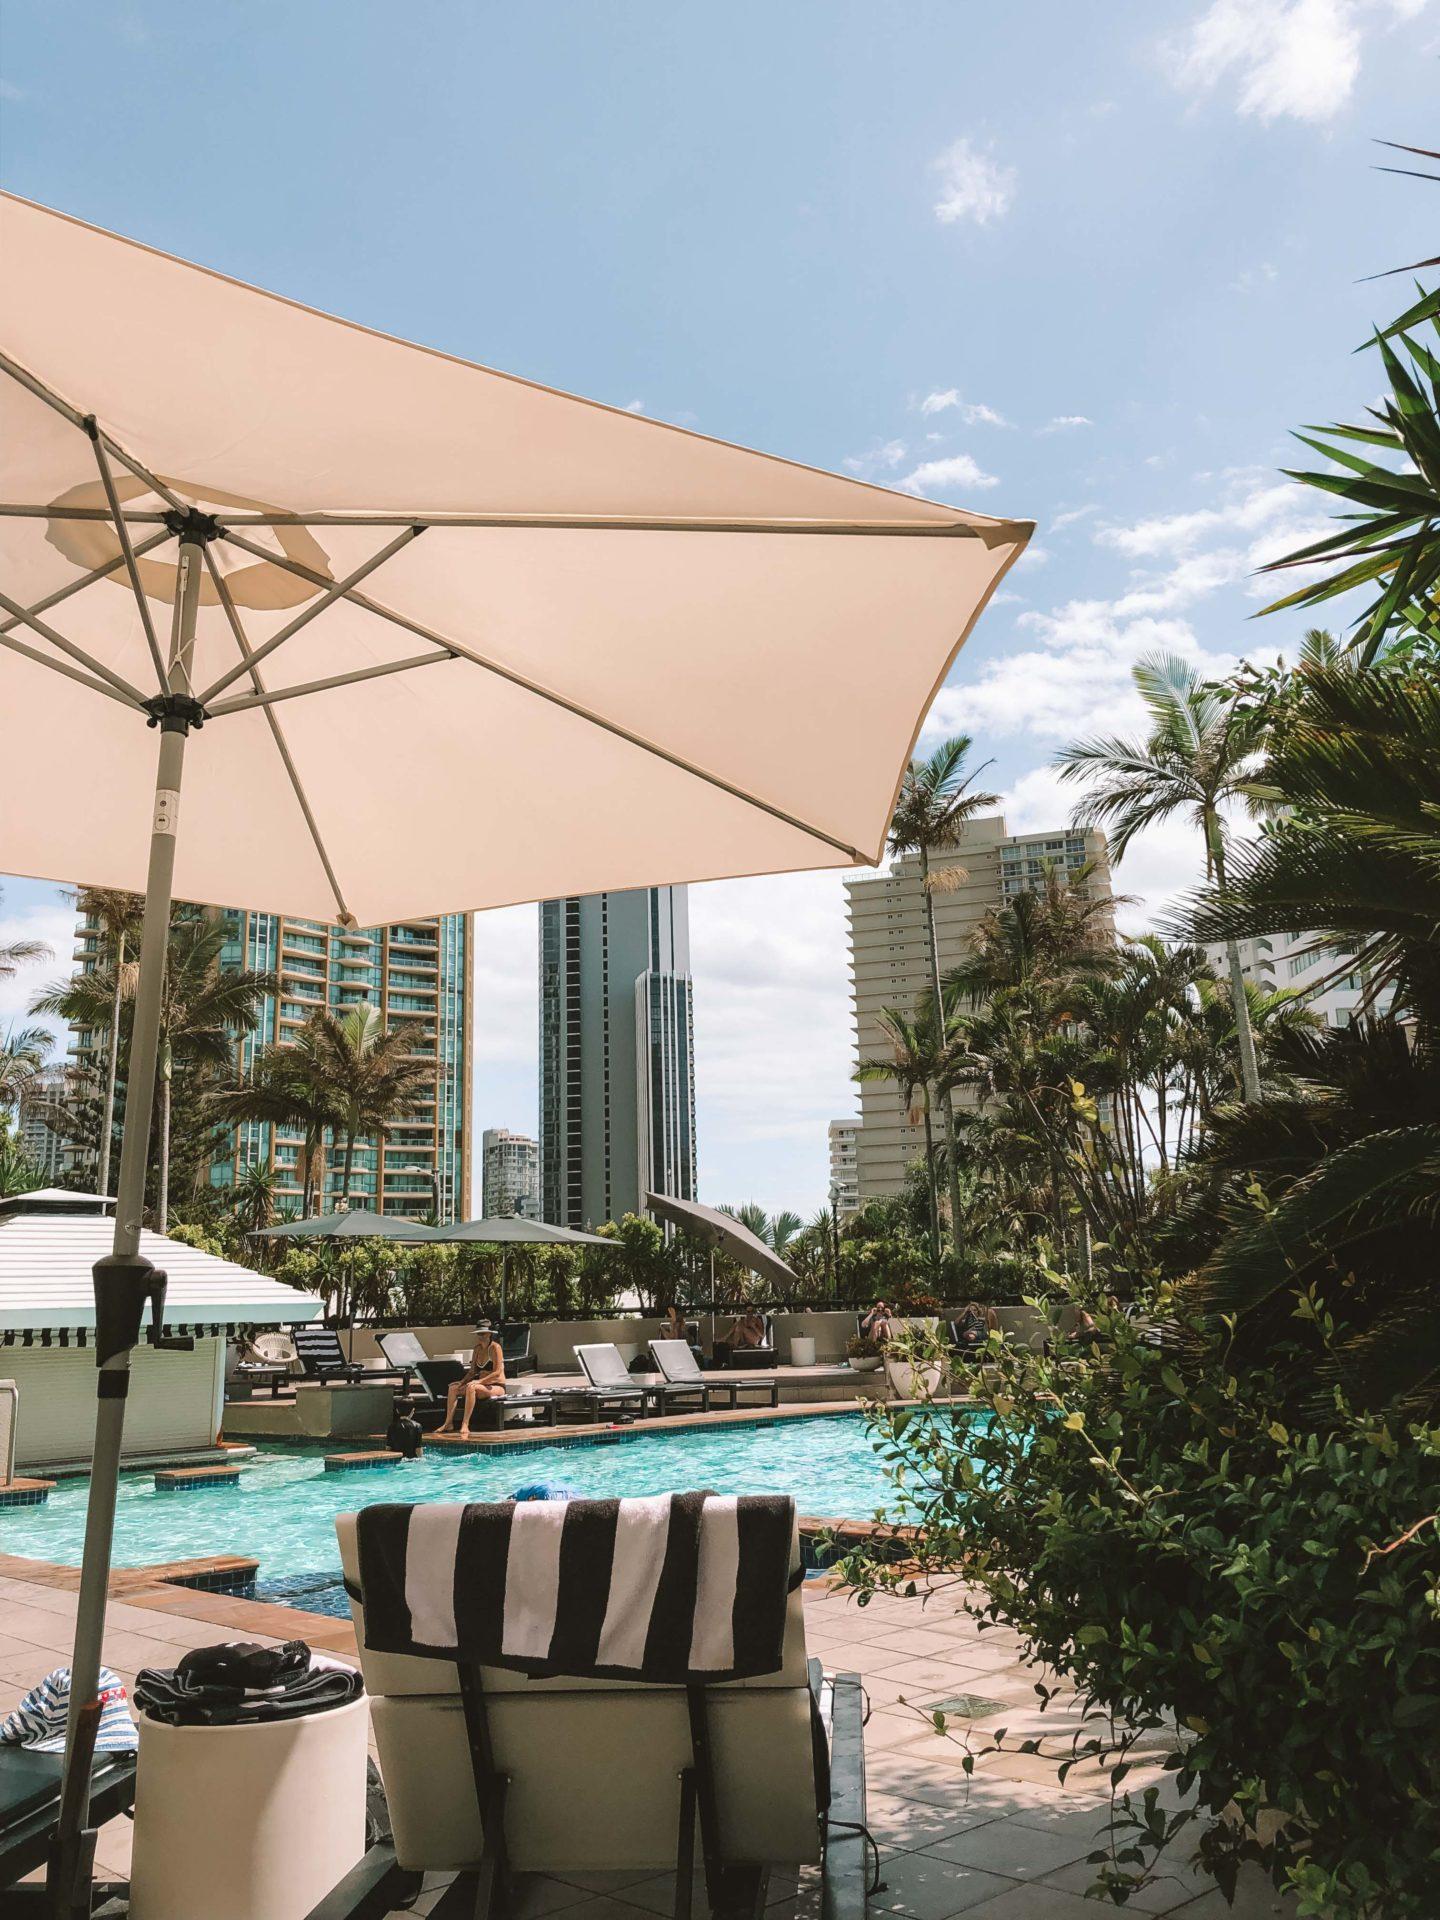 QT Hotel Gold Coast - Blondie Baby blog mode et voyages